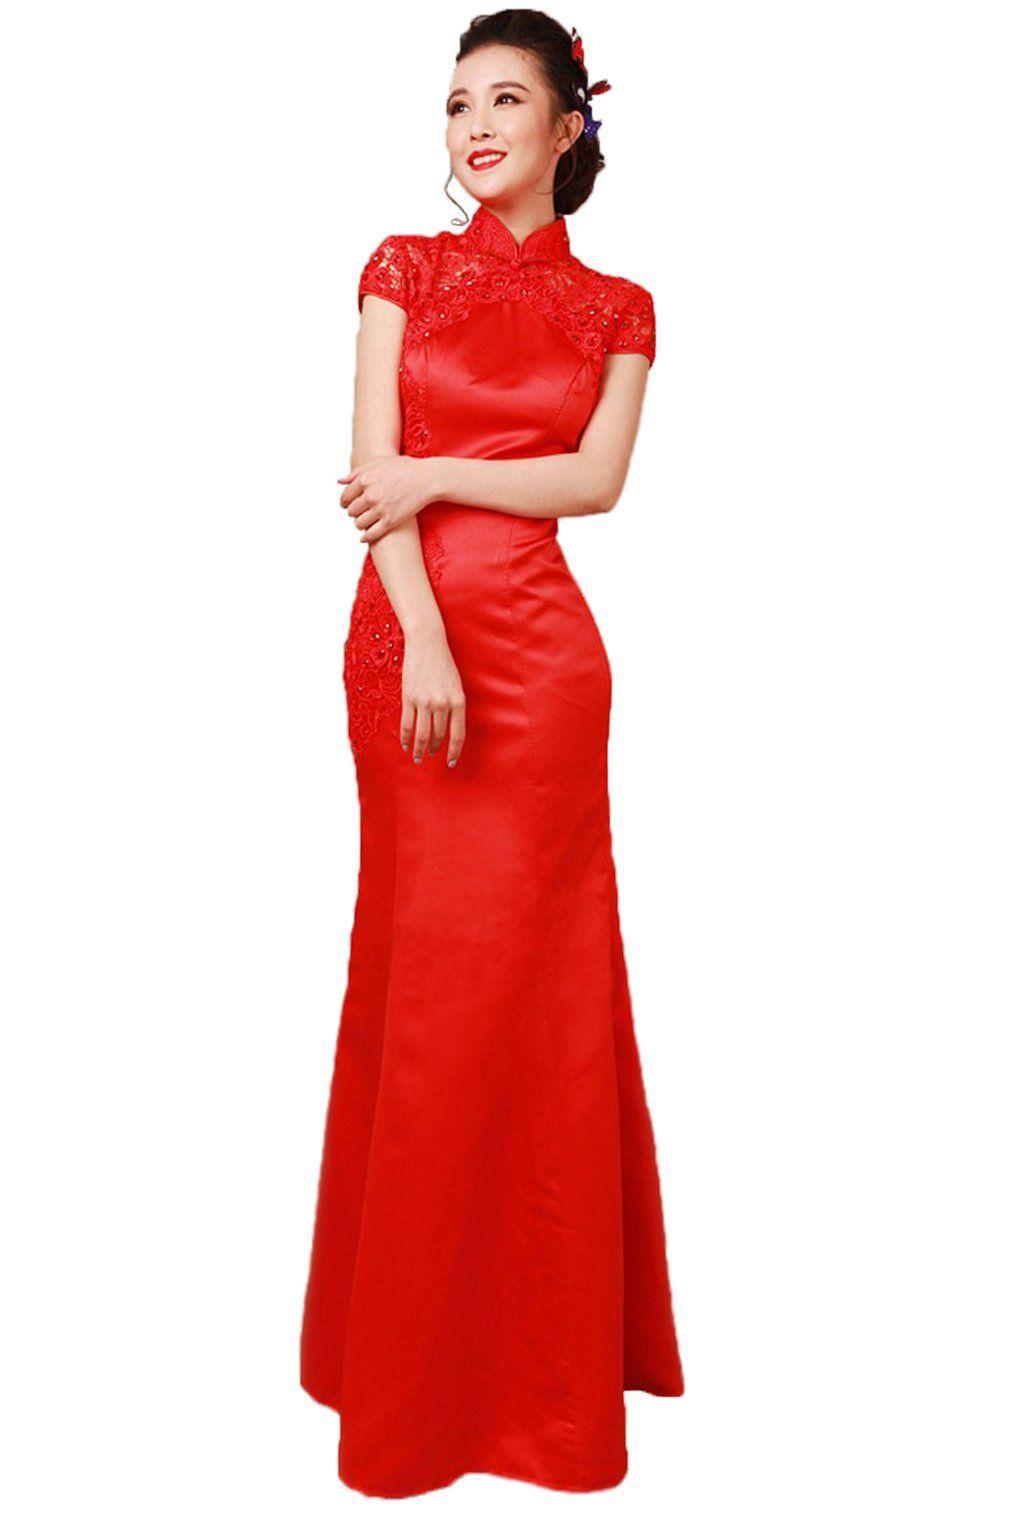 Angel formal dresses womenus red cheongsam wedding dresses prom